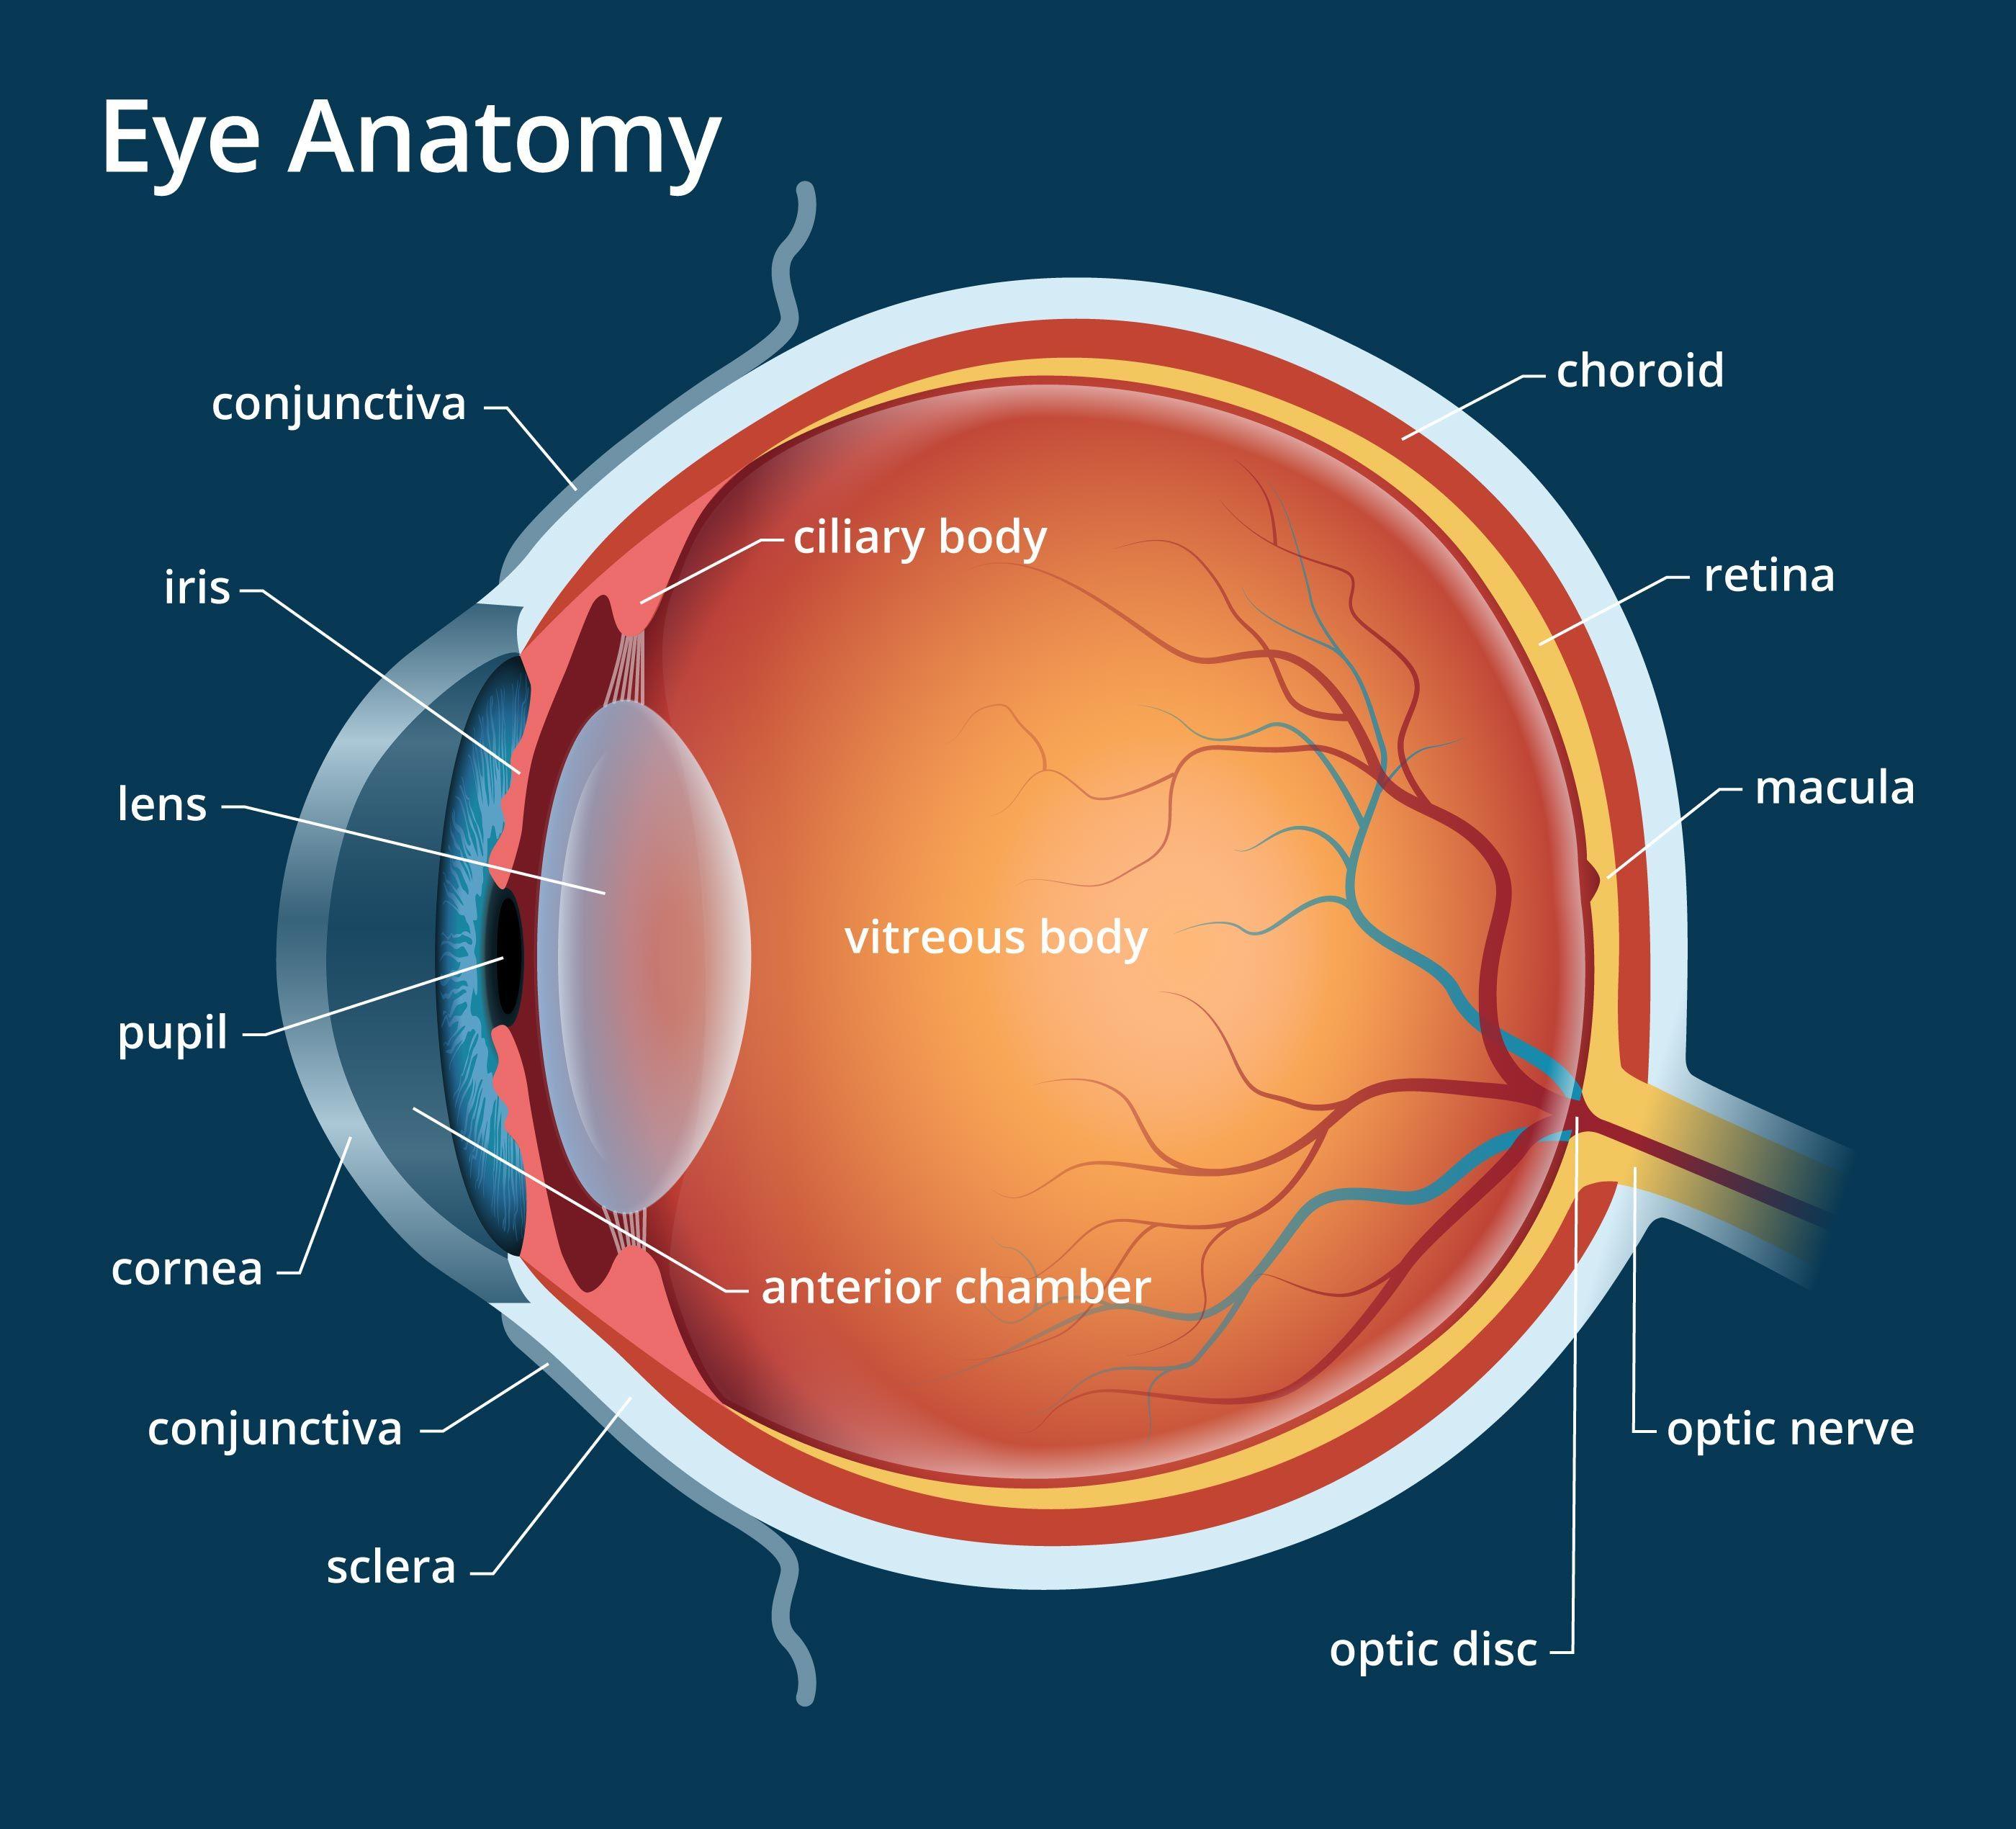 human eye anatomy parts of the eye explained bluetooth electronics consumer electronics [ 2800 x 2540 Pixel ]